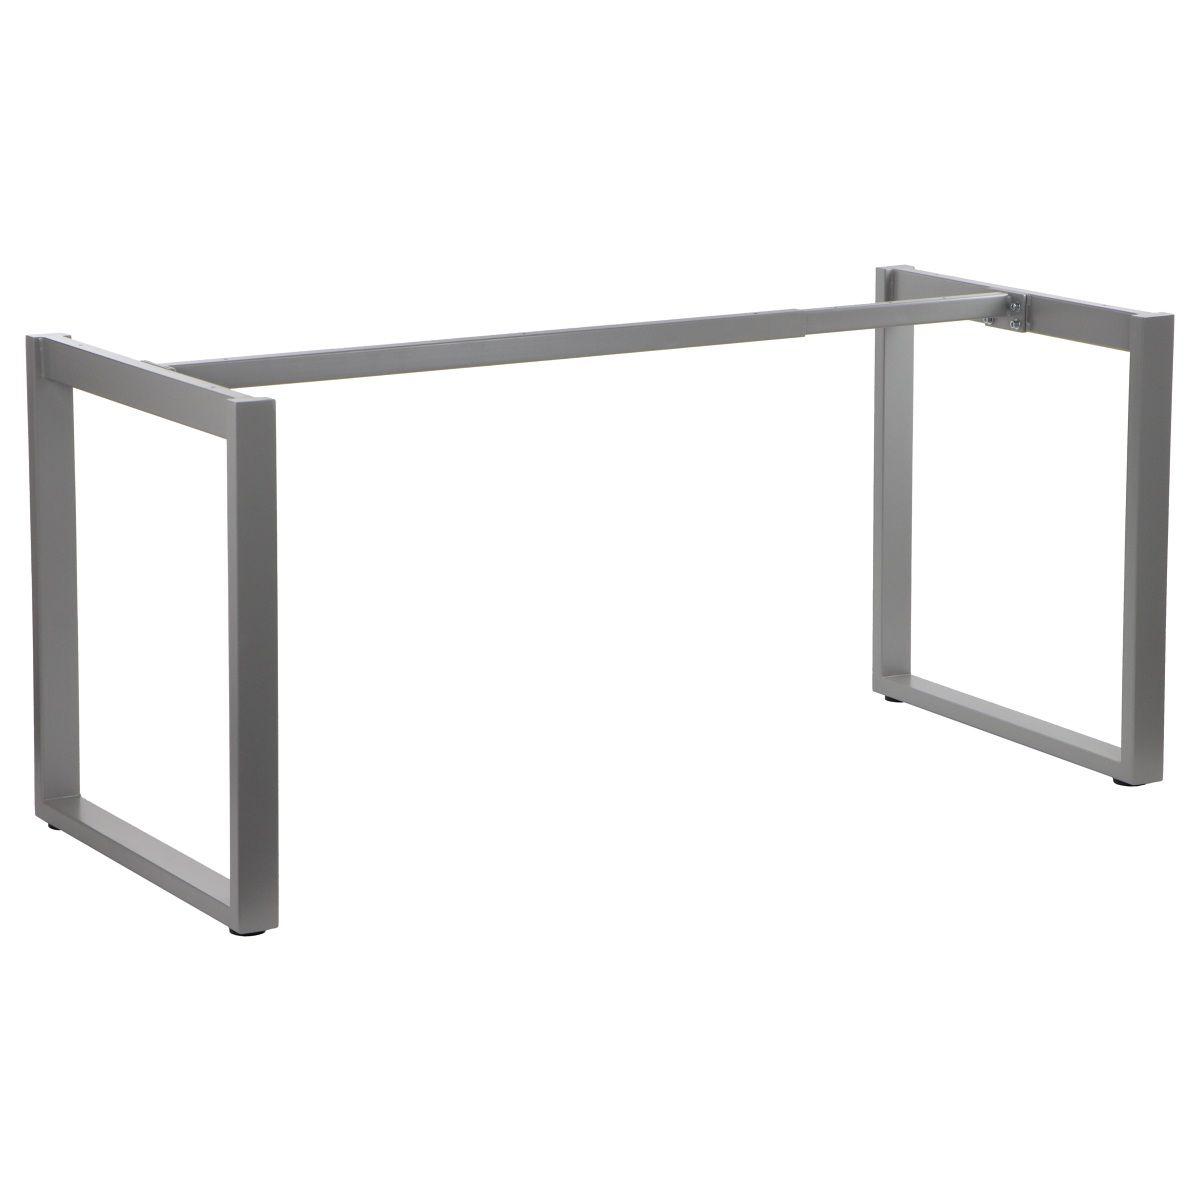 Stelaż skręcany do stołu i biurka EF-NY-131 aluminium 139,6x69,6 cm